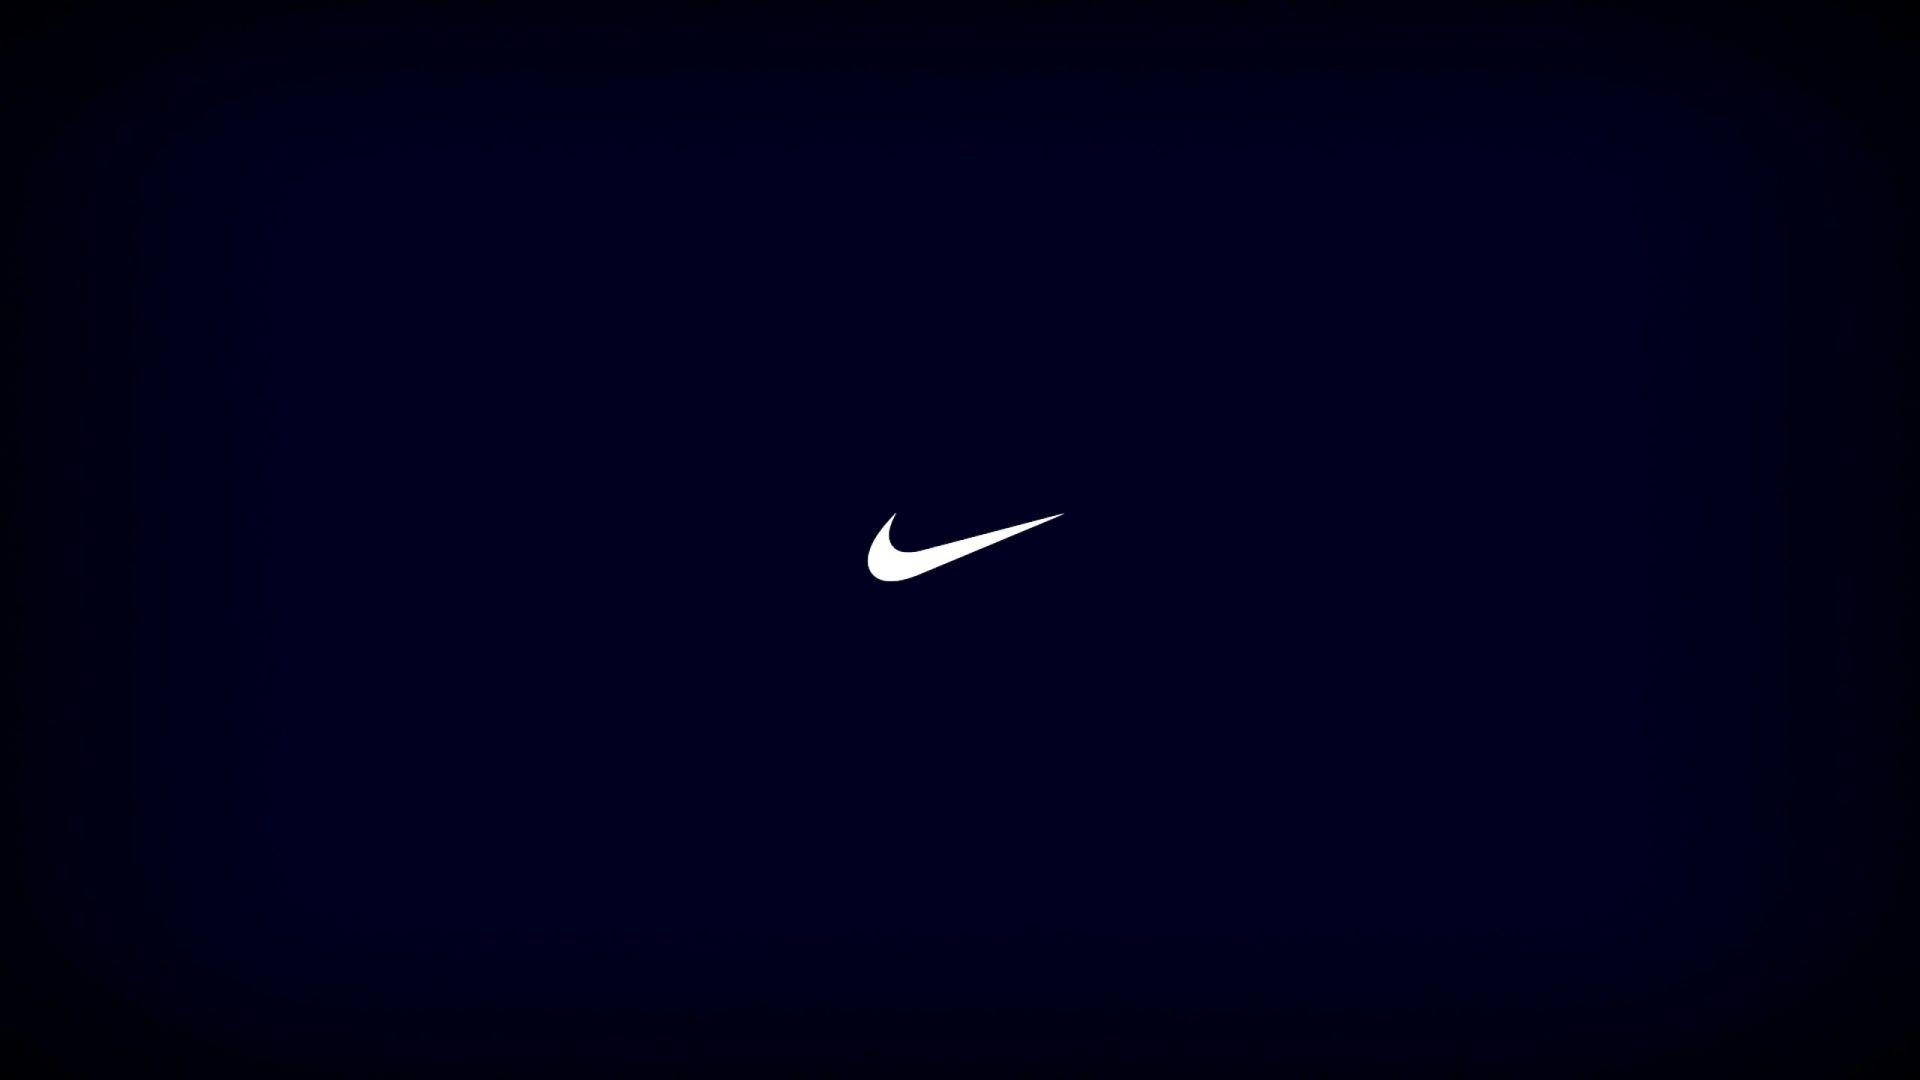 Nike Wallpapers Logo 1920x1080